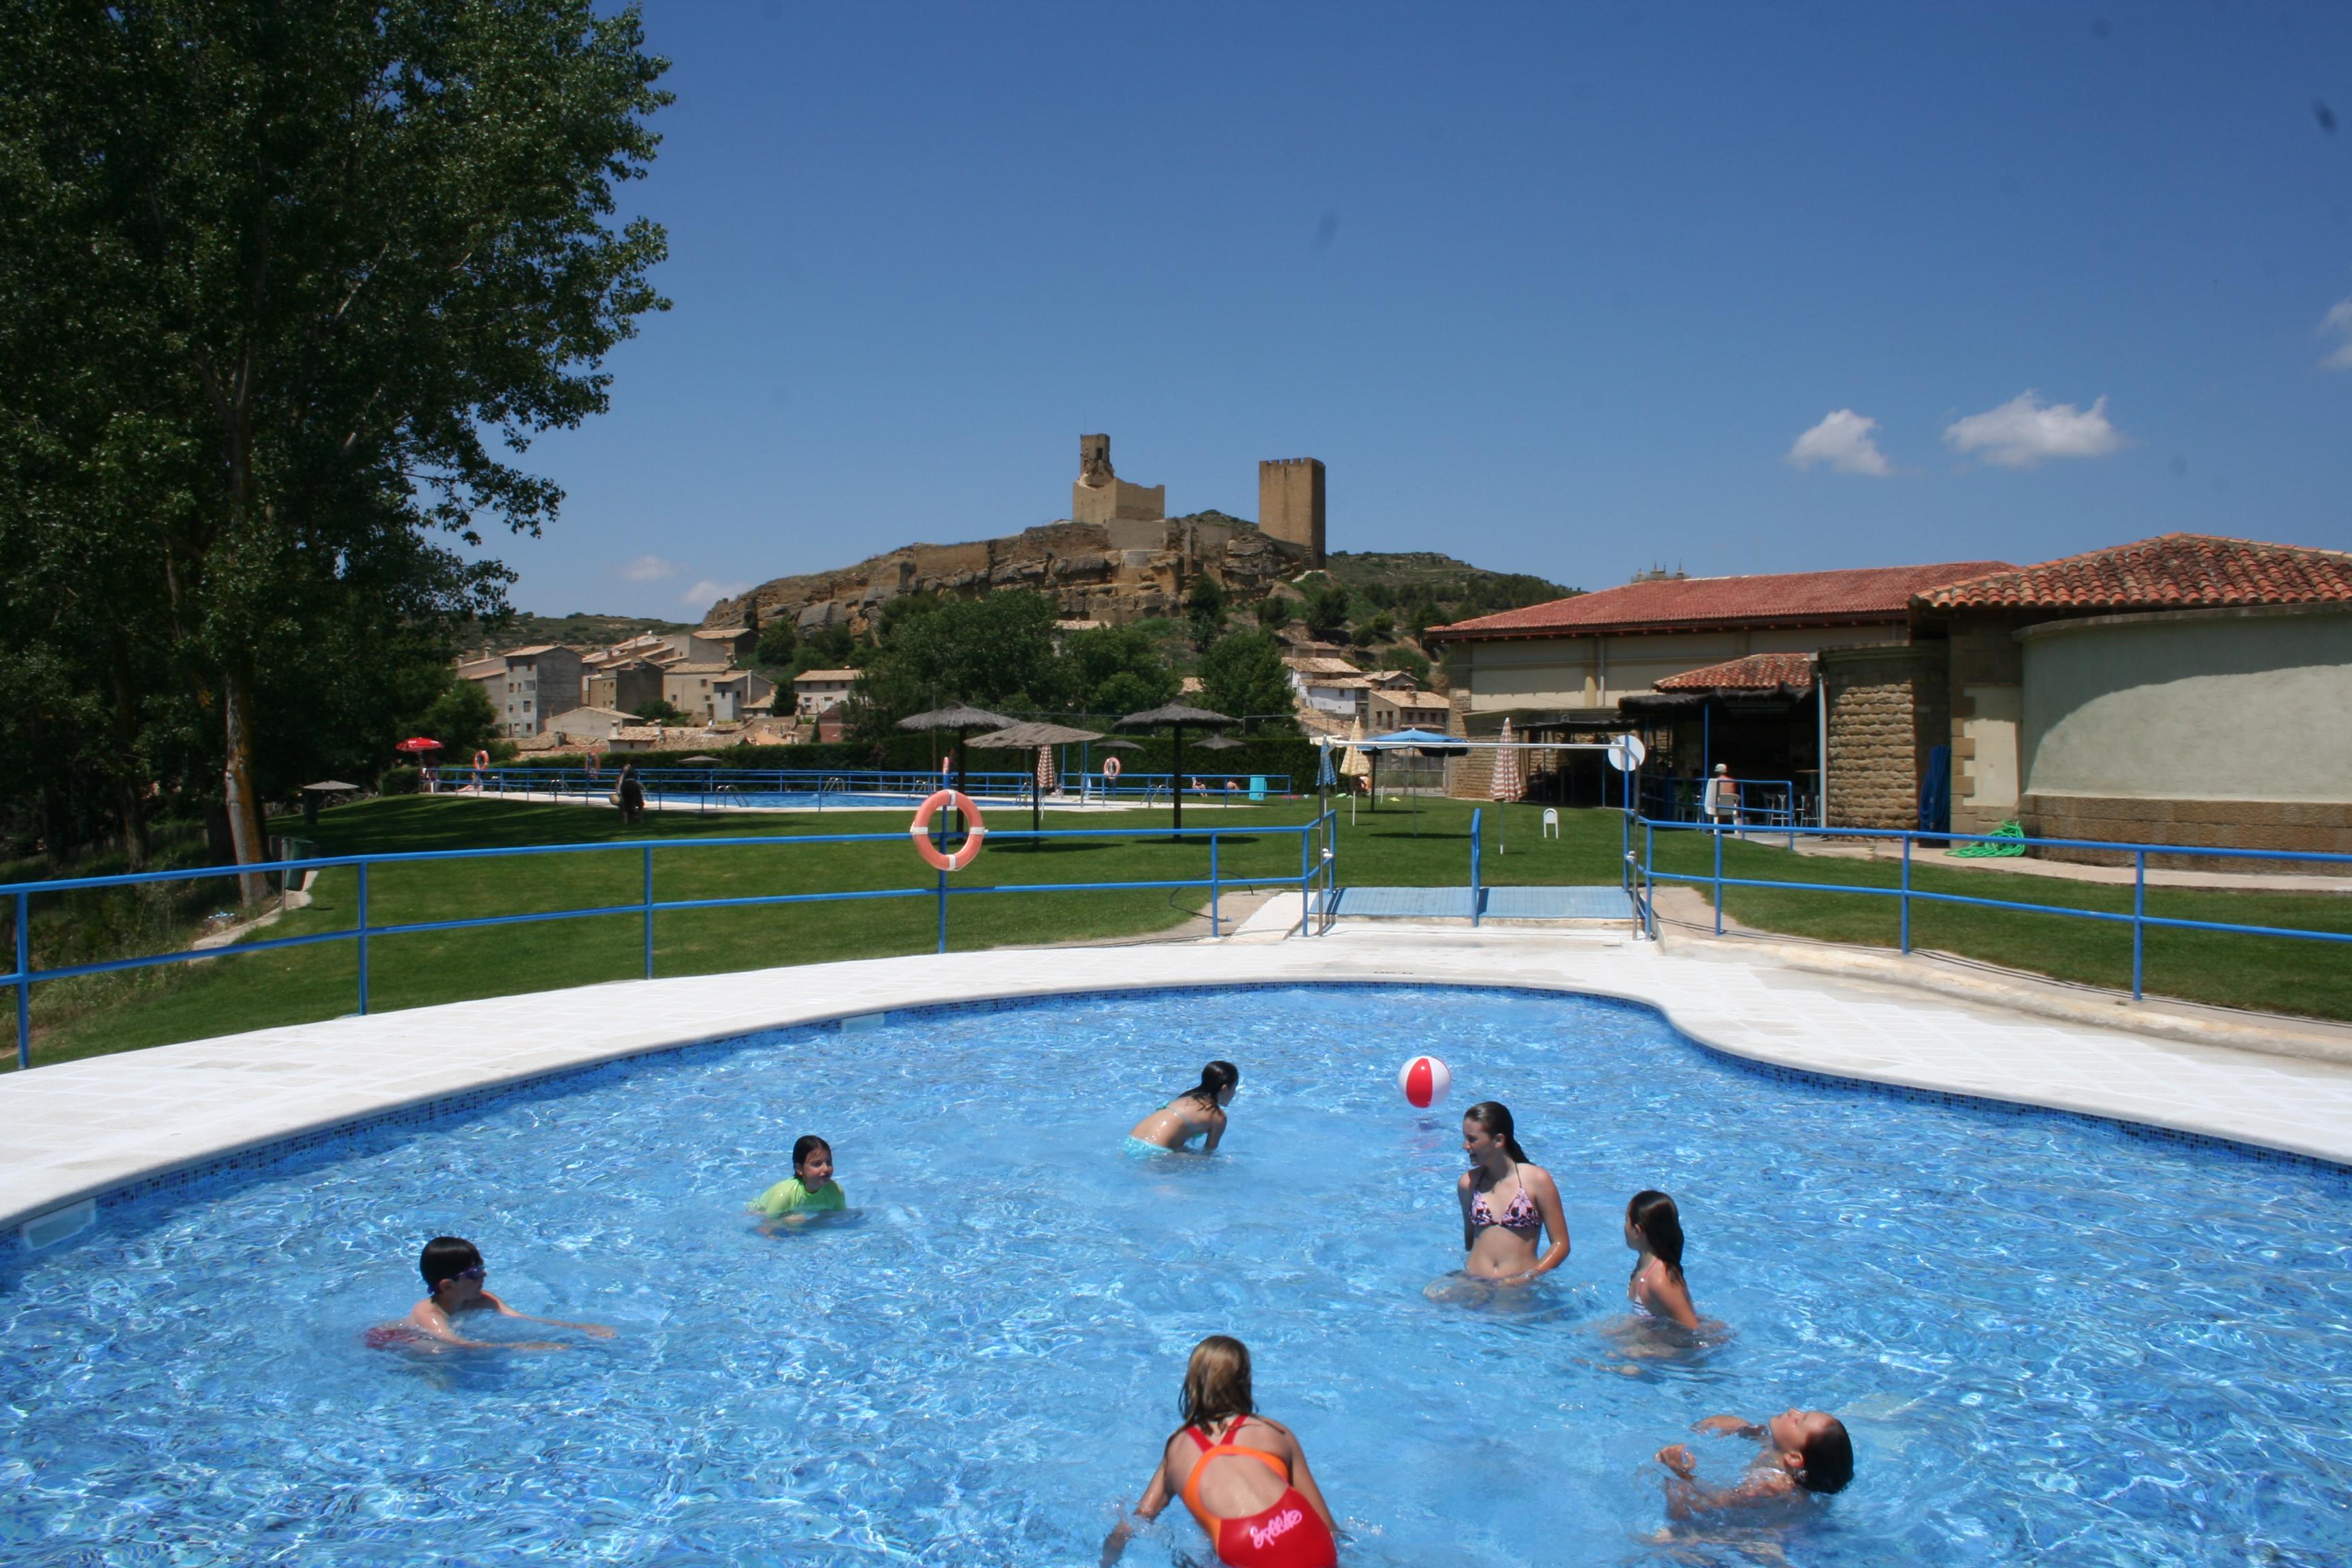 Piscina municipal de Uncastillo cerca de Sos del Rey Católico